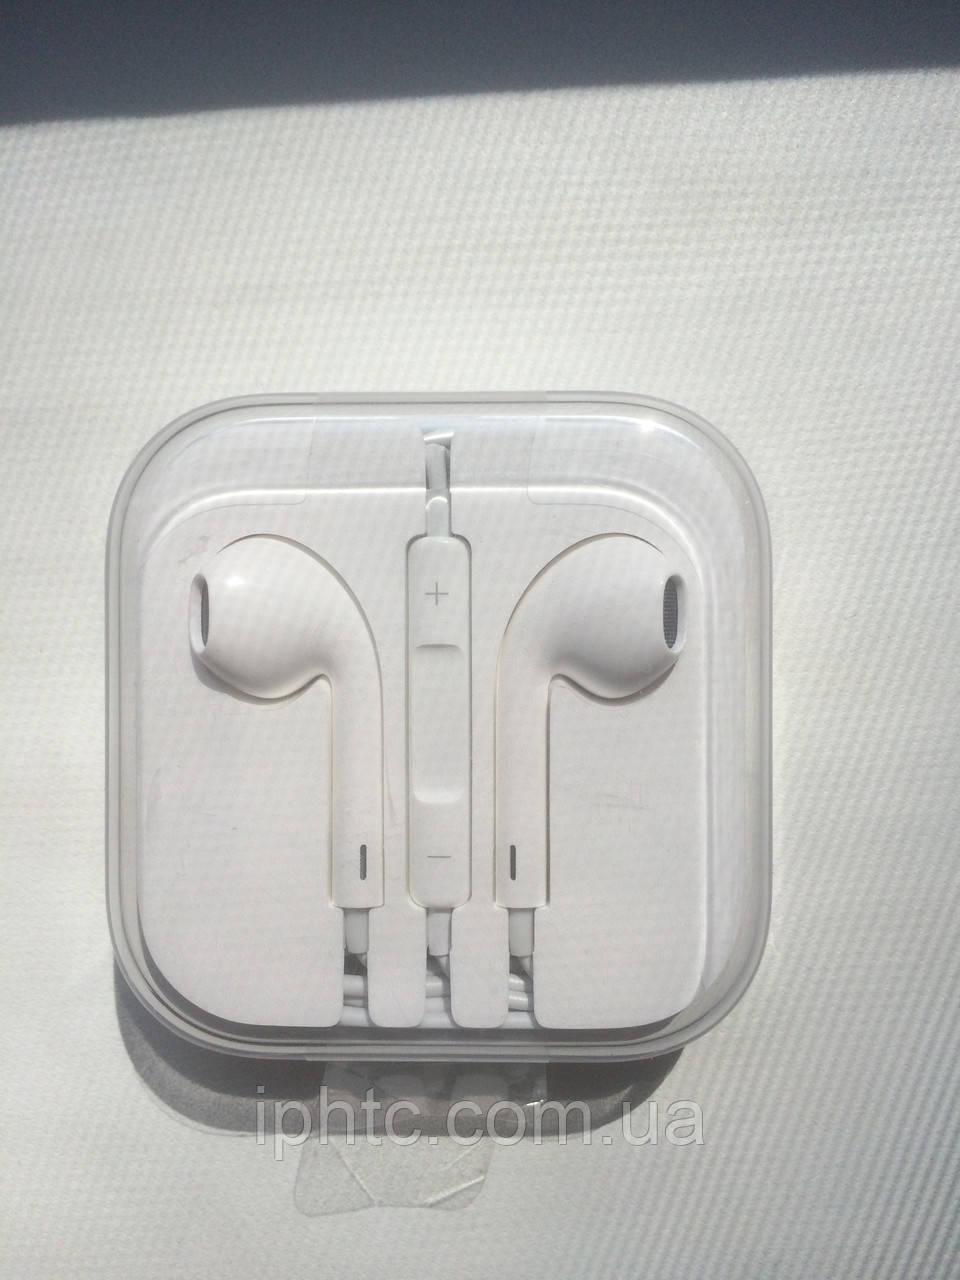 Оригинал наушники Apple EarPods with Remote and Mic - Интернет магазин  iYablochko в Днепре a388f378ec7fb